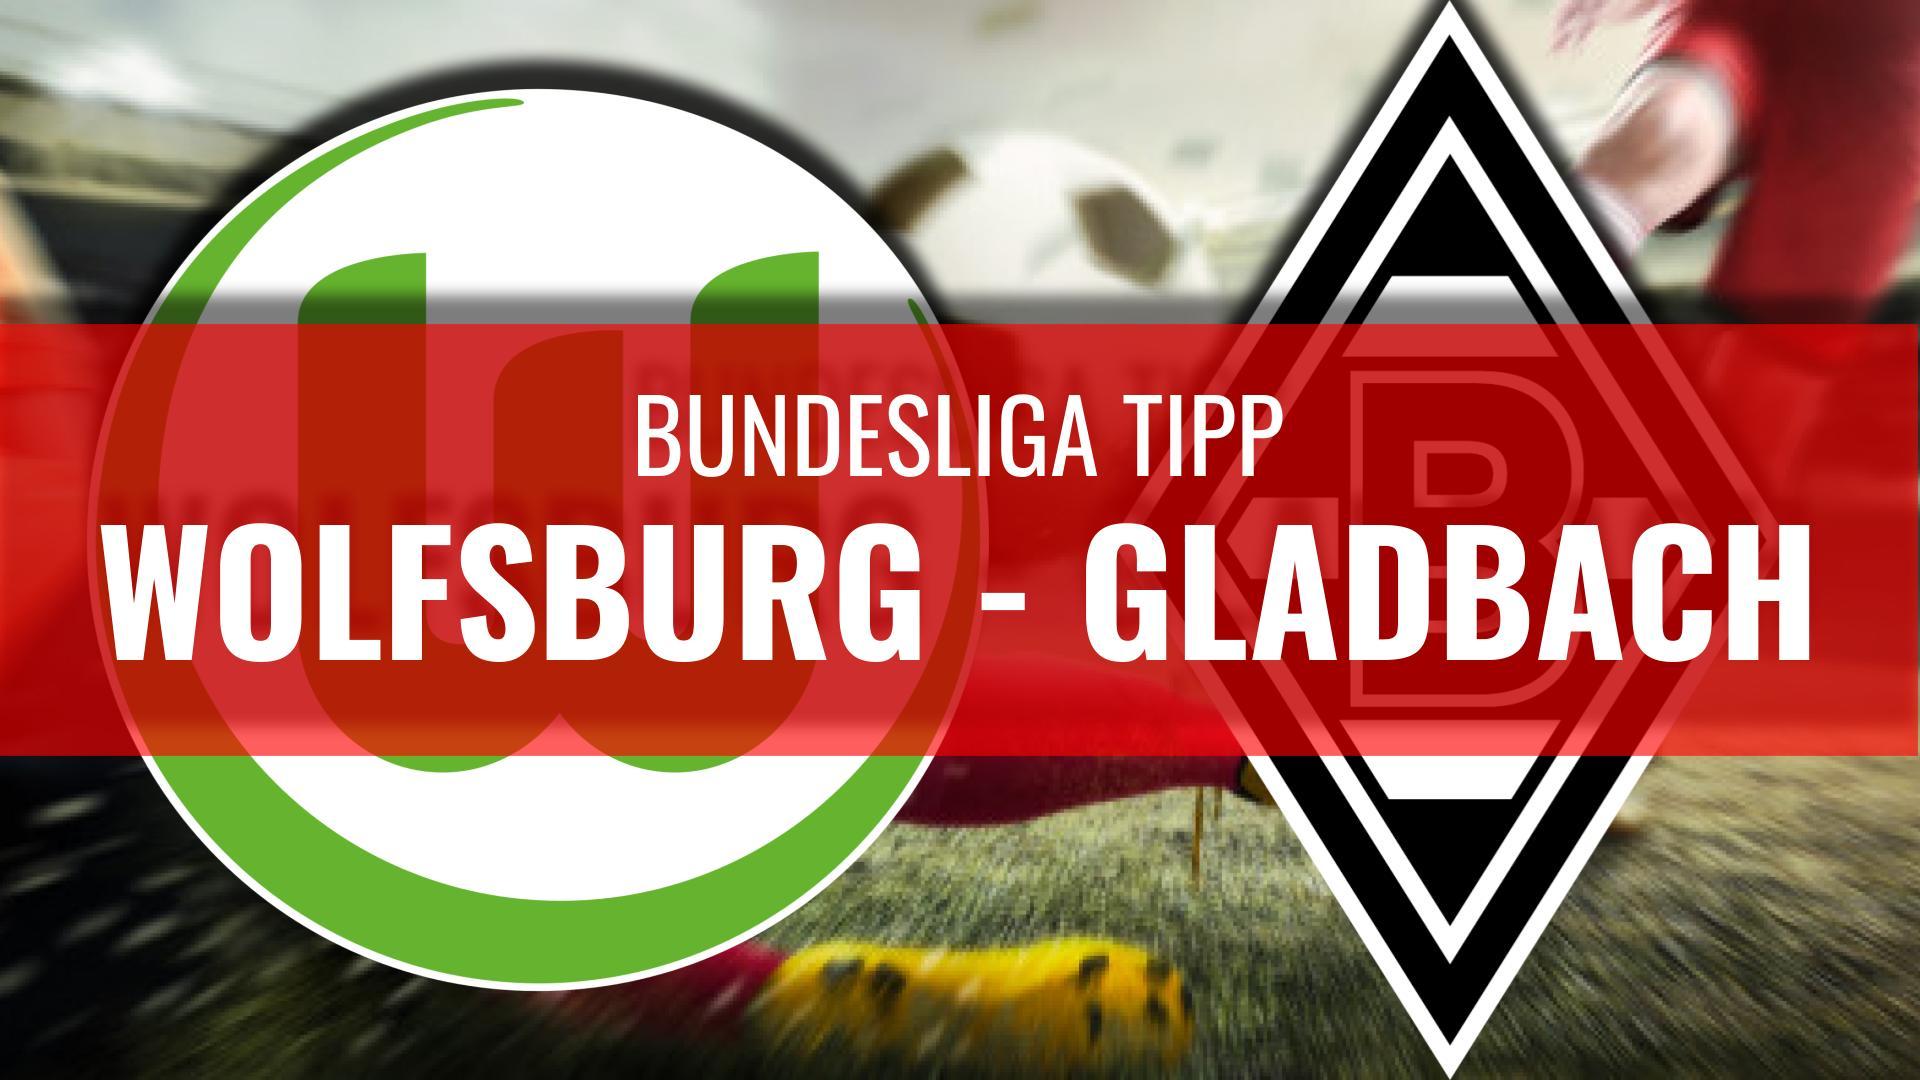 WOLFSBURG - GLADBACH-Bundesliga-Wett-Tipps-21